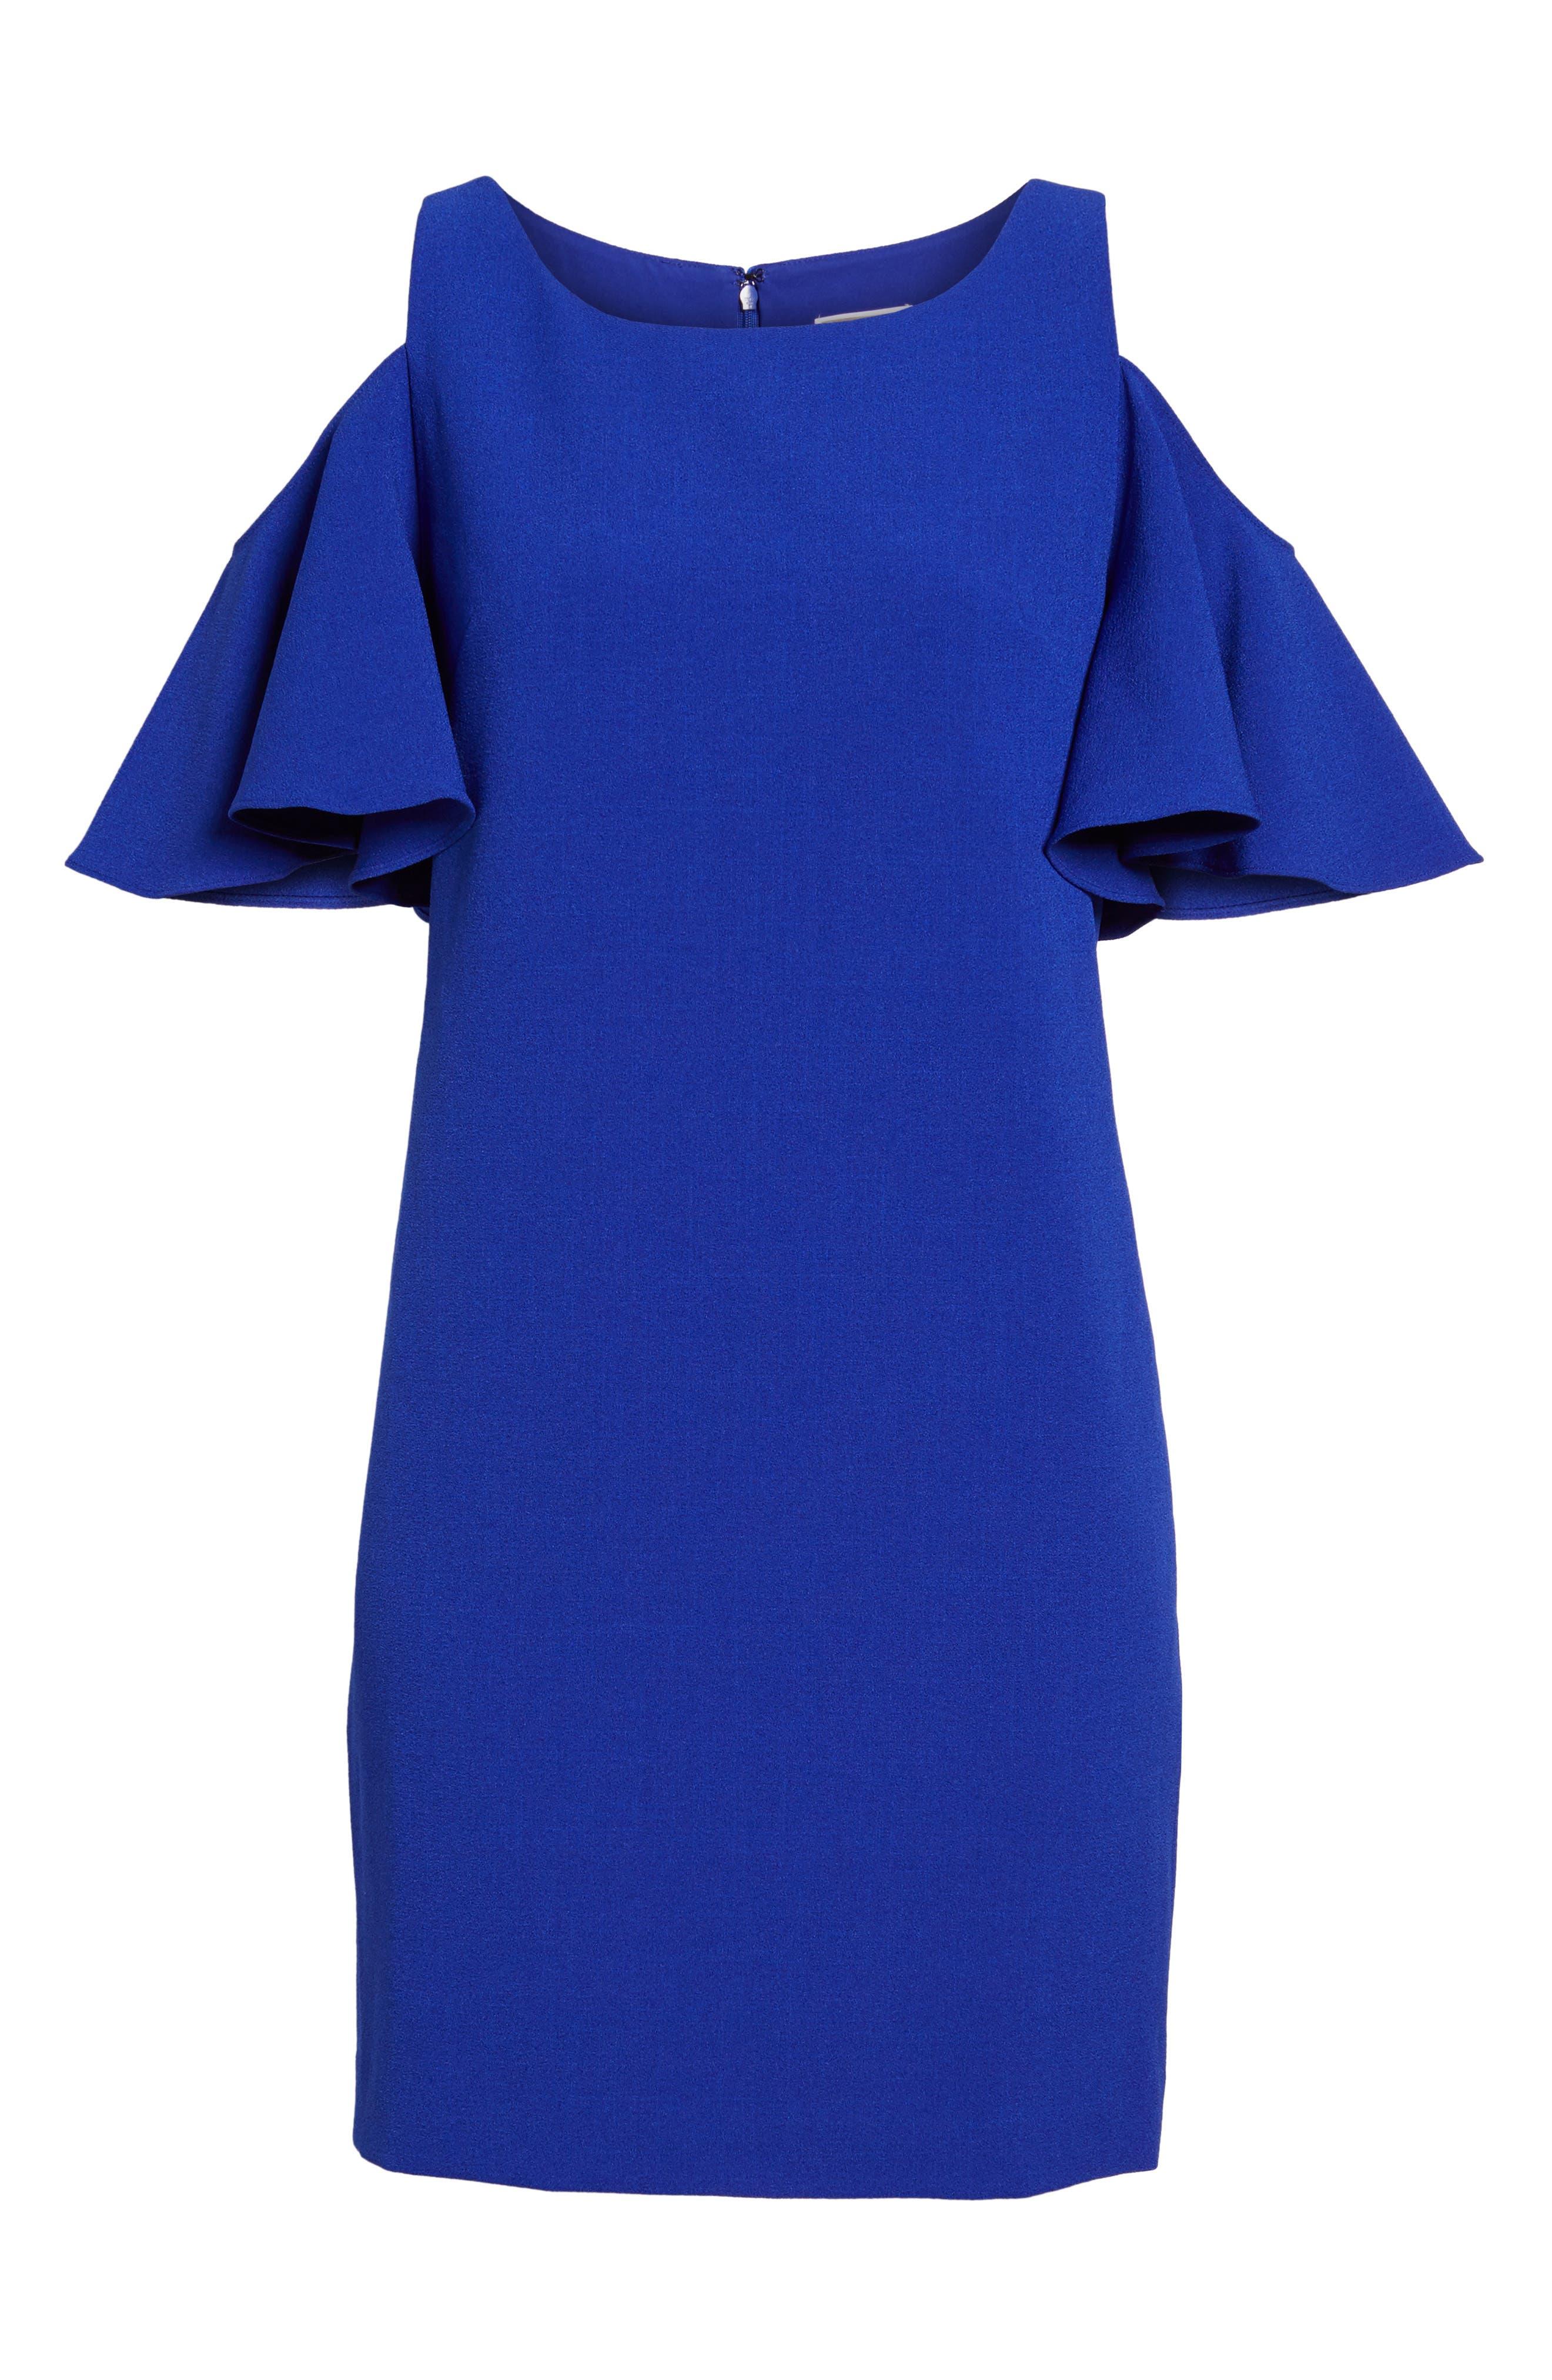 'Peek-A-Boo' Cold Shoulder Shift Dress,                             Alternate thumbnail 4, color,